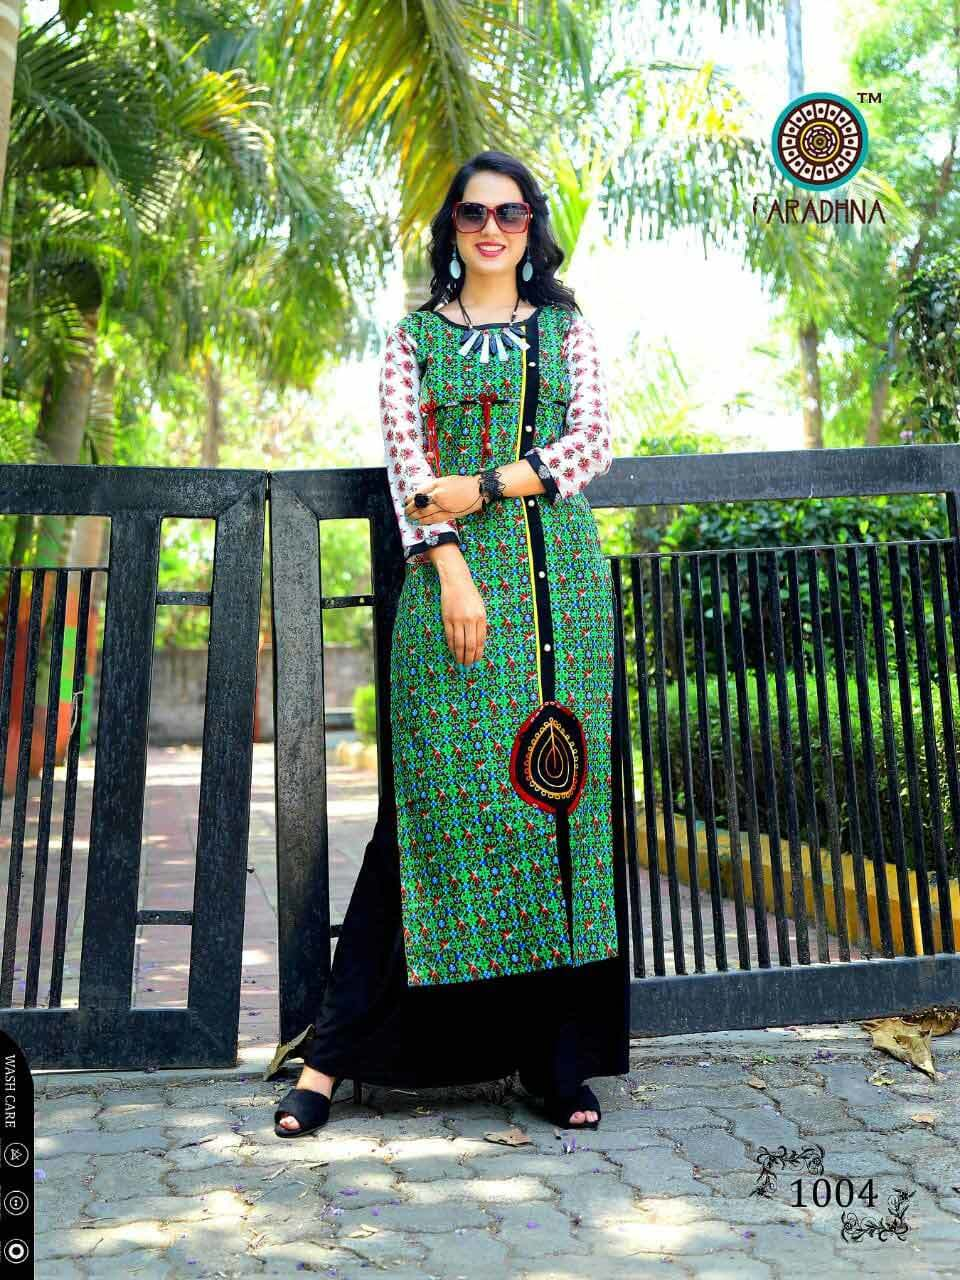 Chocolaty Aradhna Design Rayon Cotton Print Kurtis